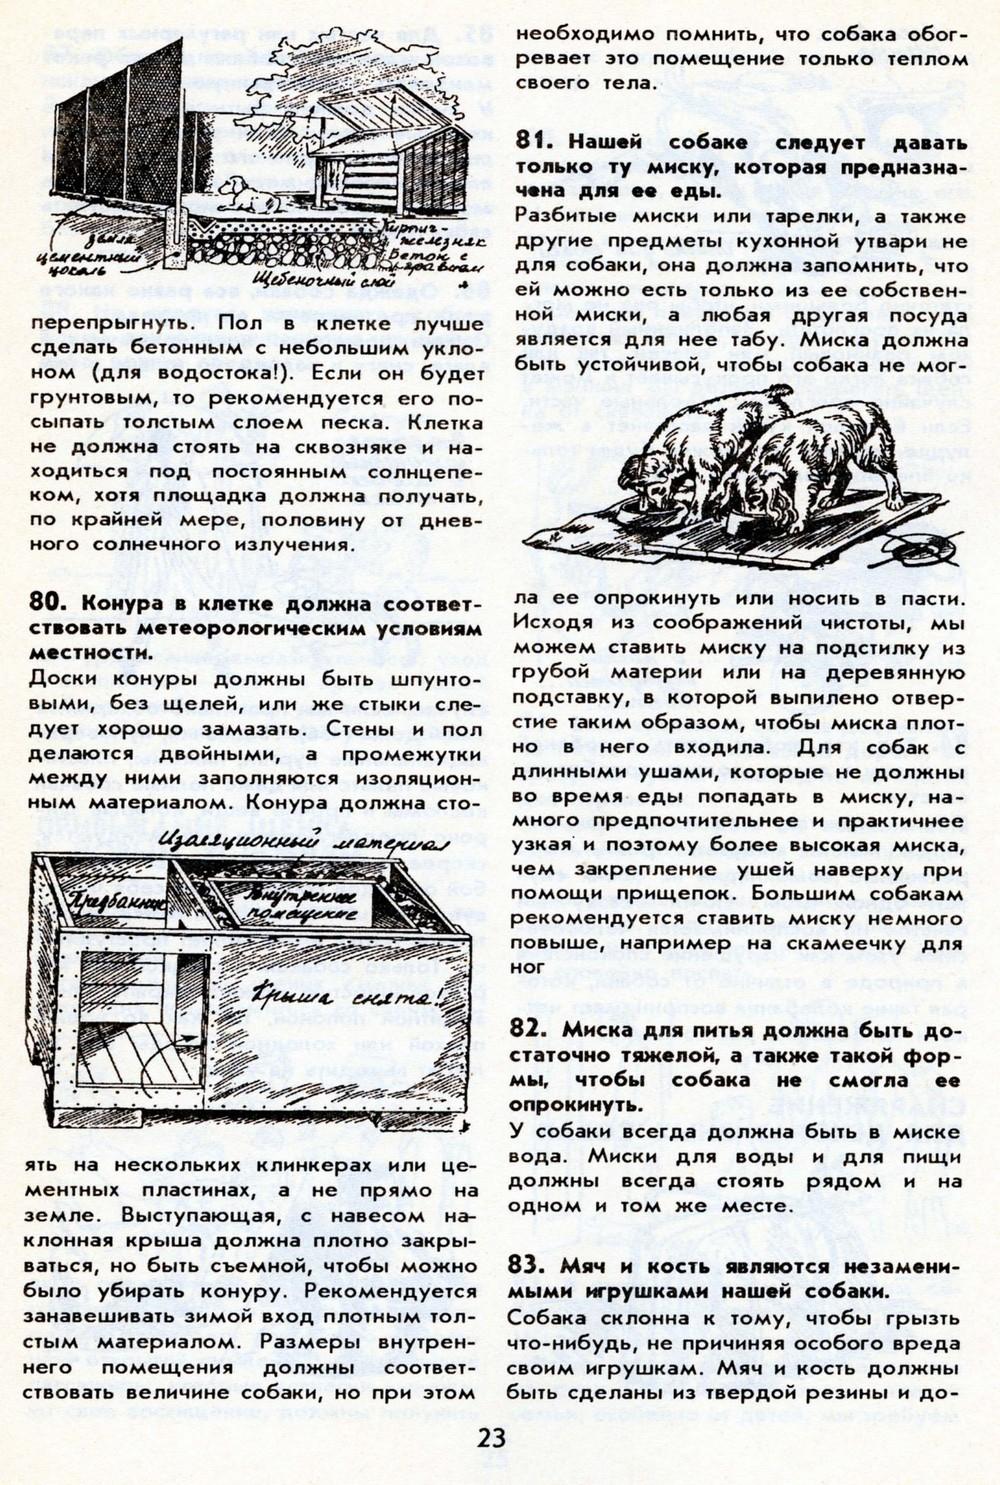 http://i2.imageban.ru/out/2013/09/12/7aafa6d3c7f8a95bcb01e2a9f0147634.jpg